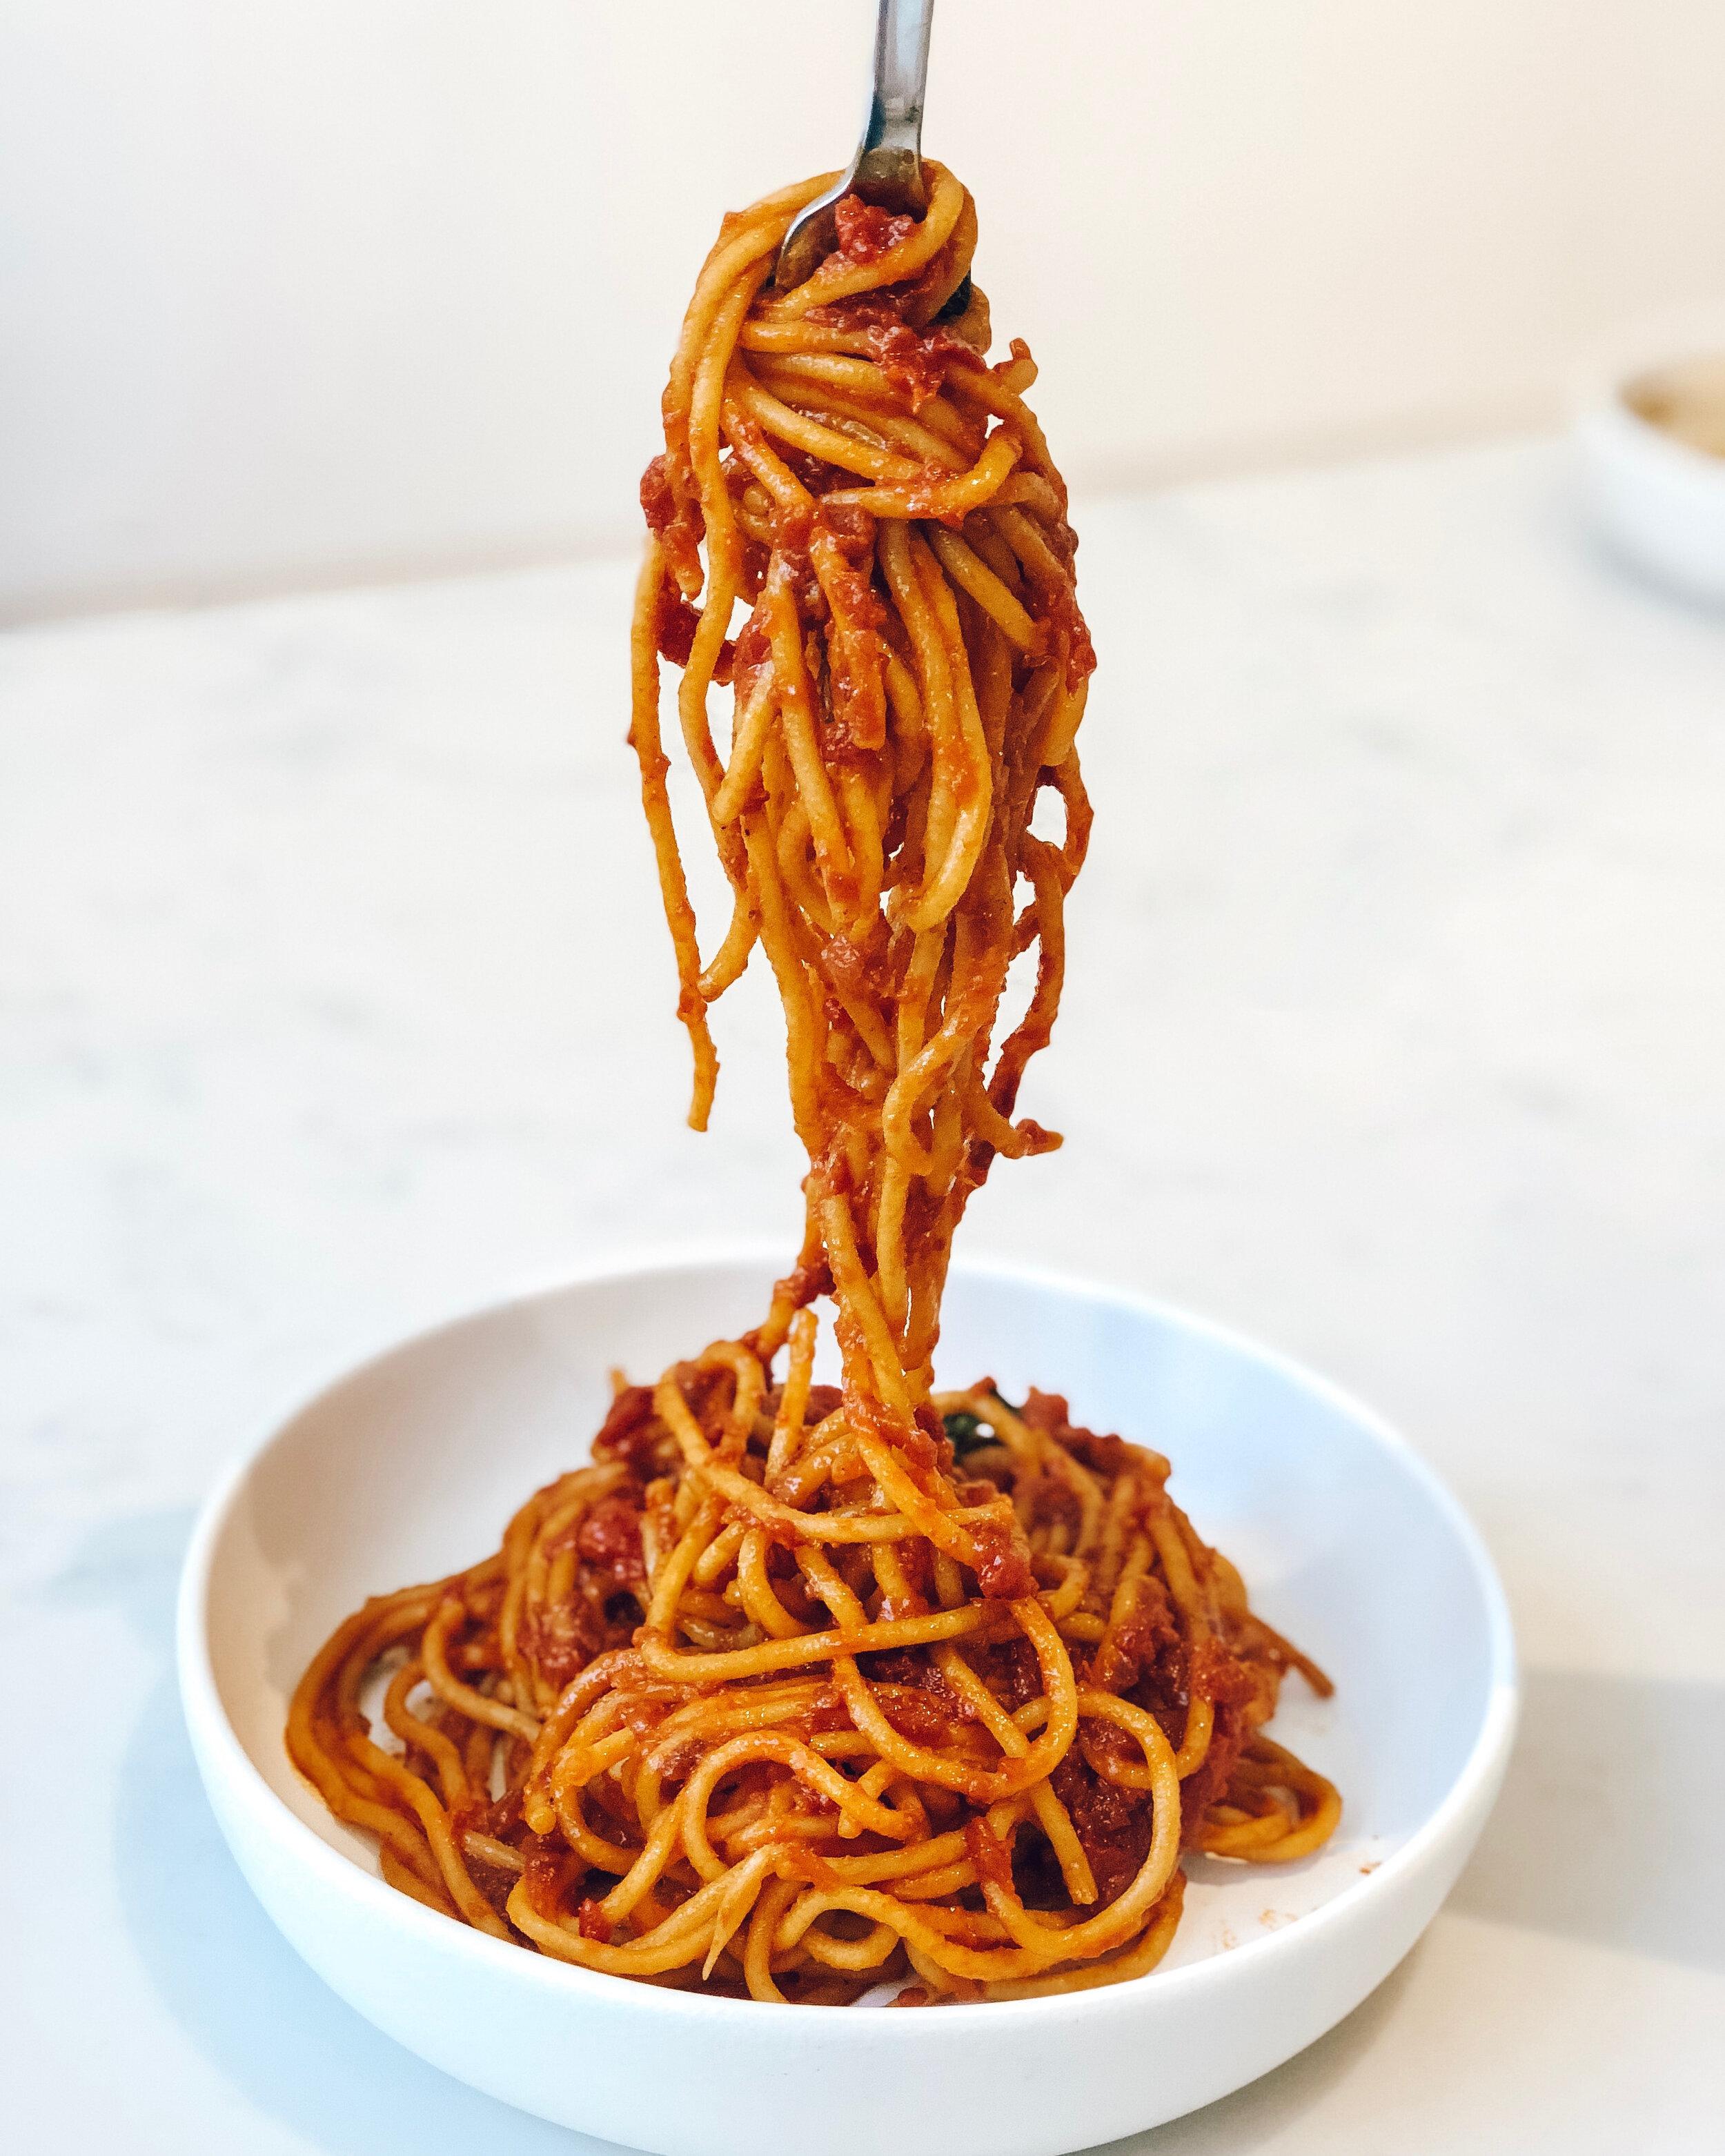 pasta with sauce.jpg